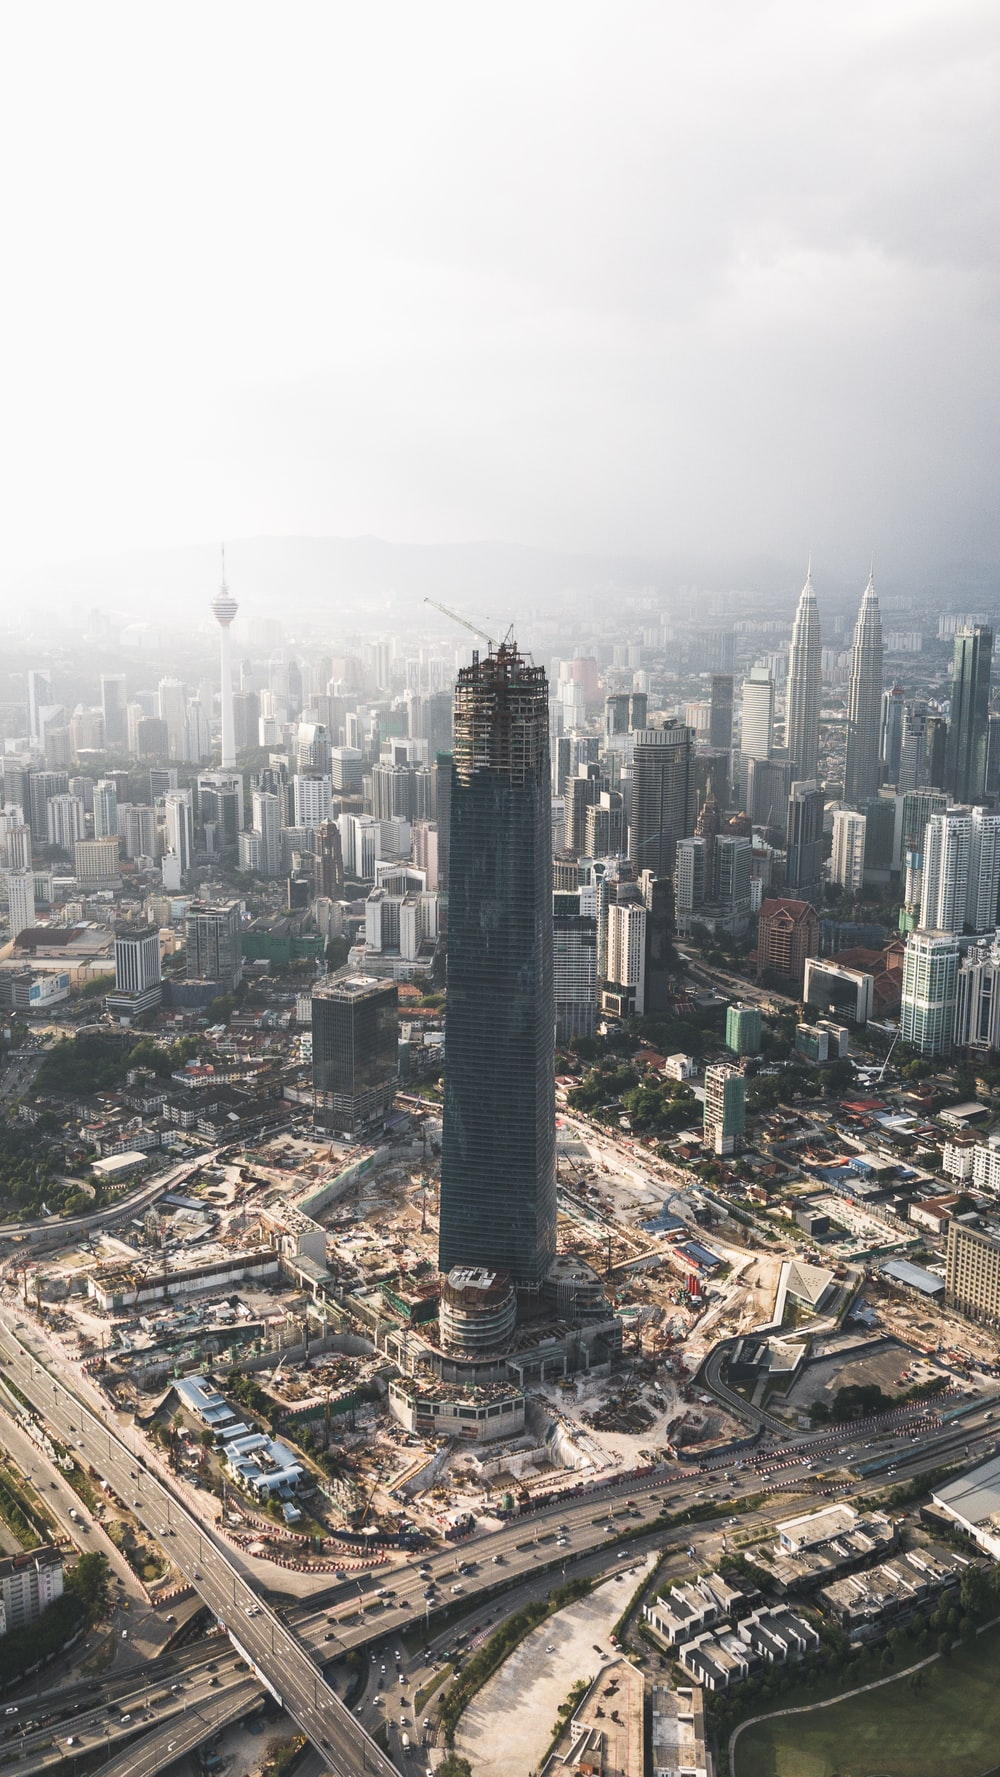 aerial photography of Malaysia skyline